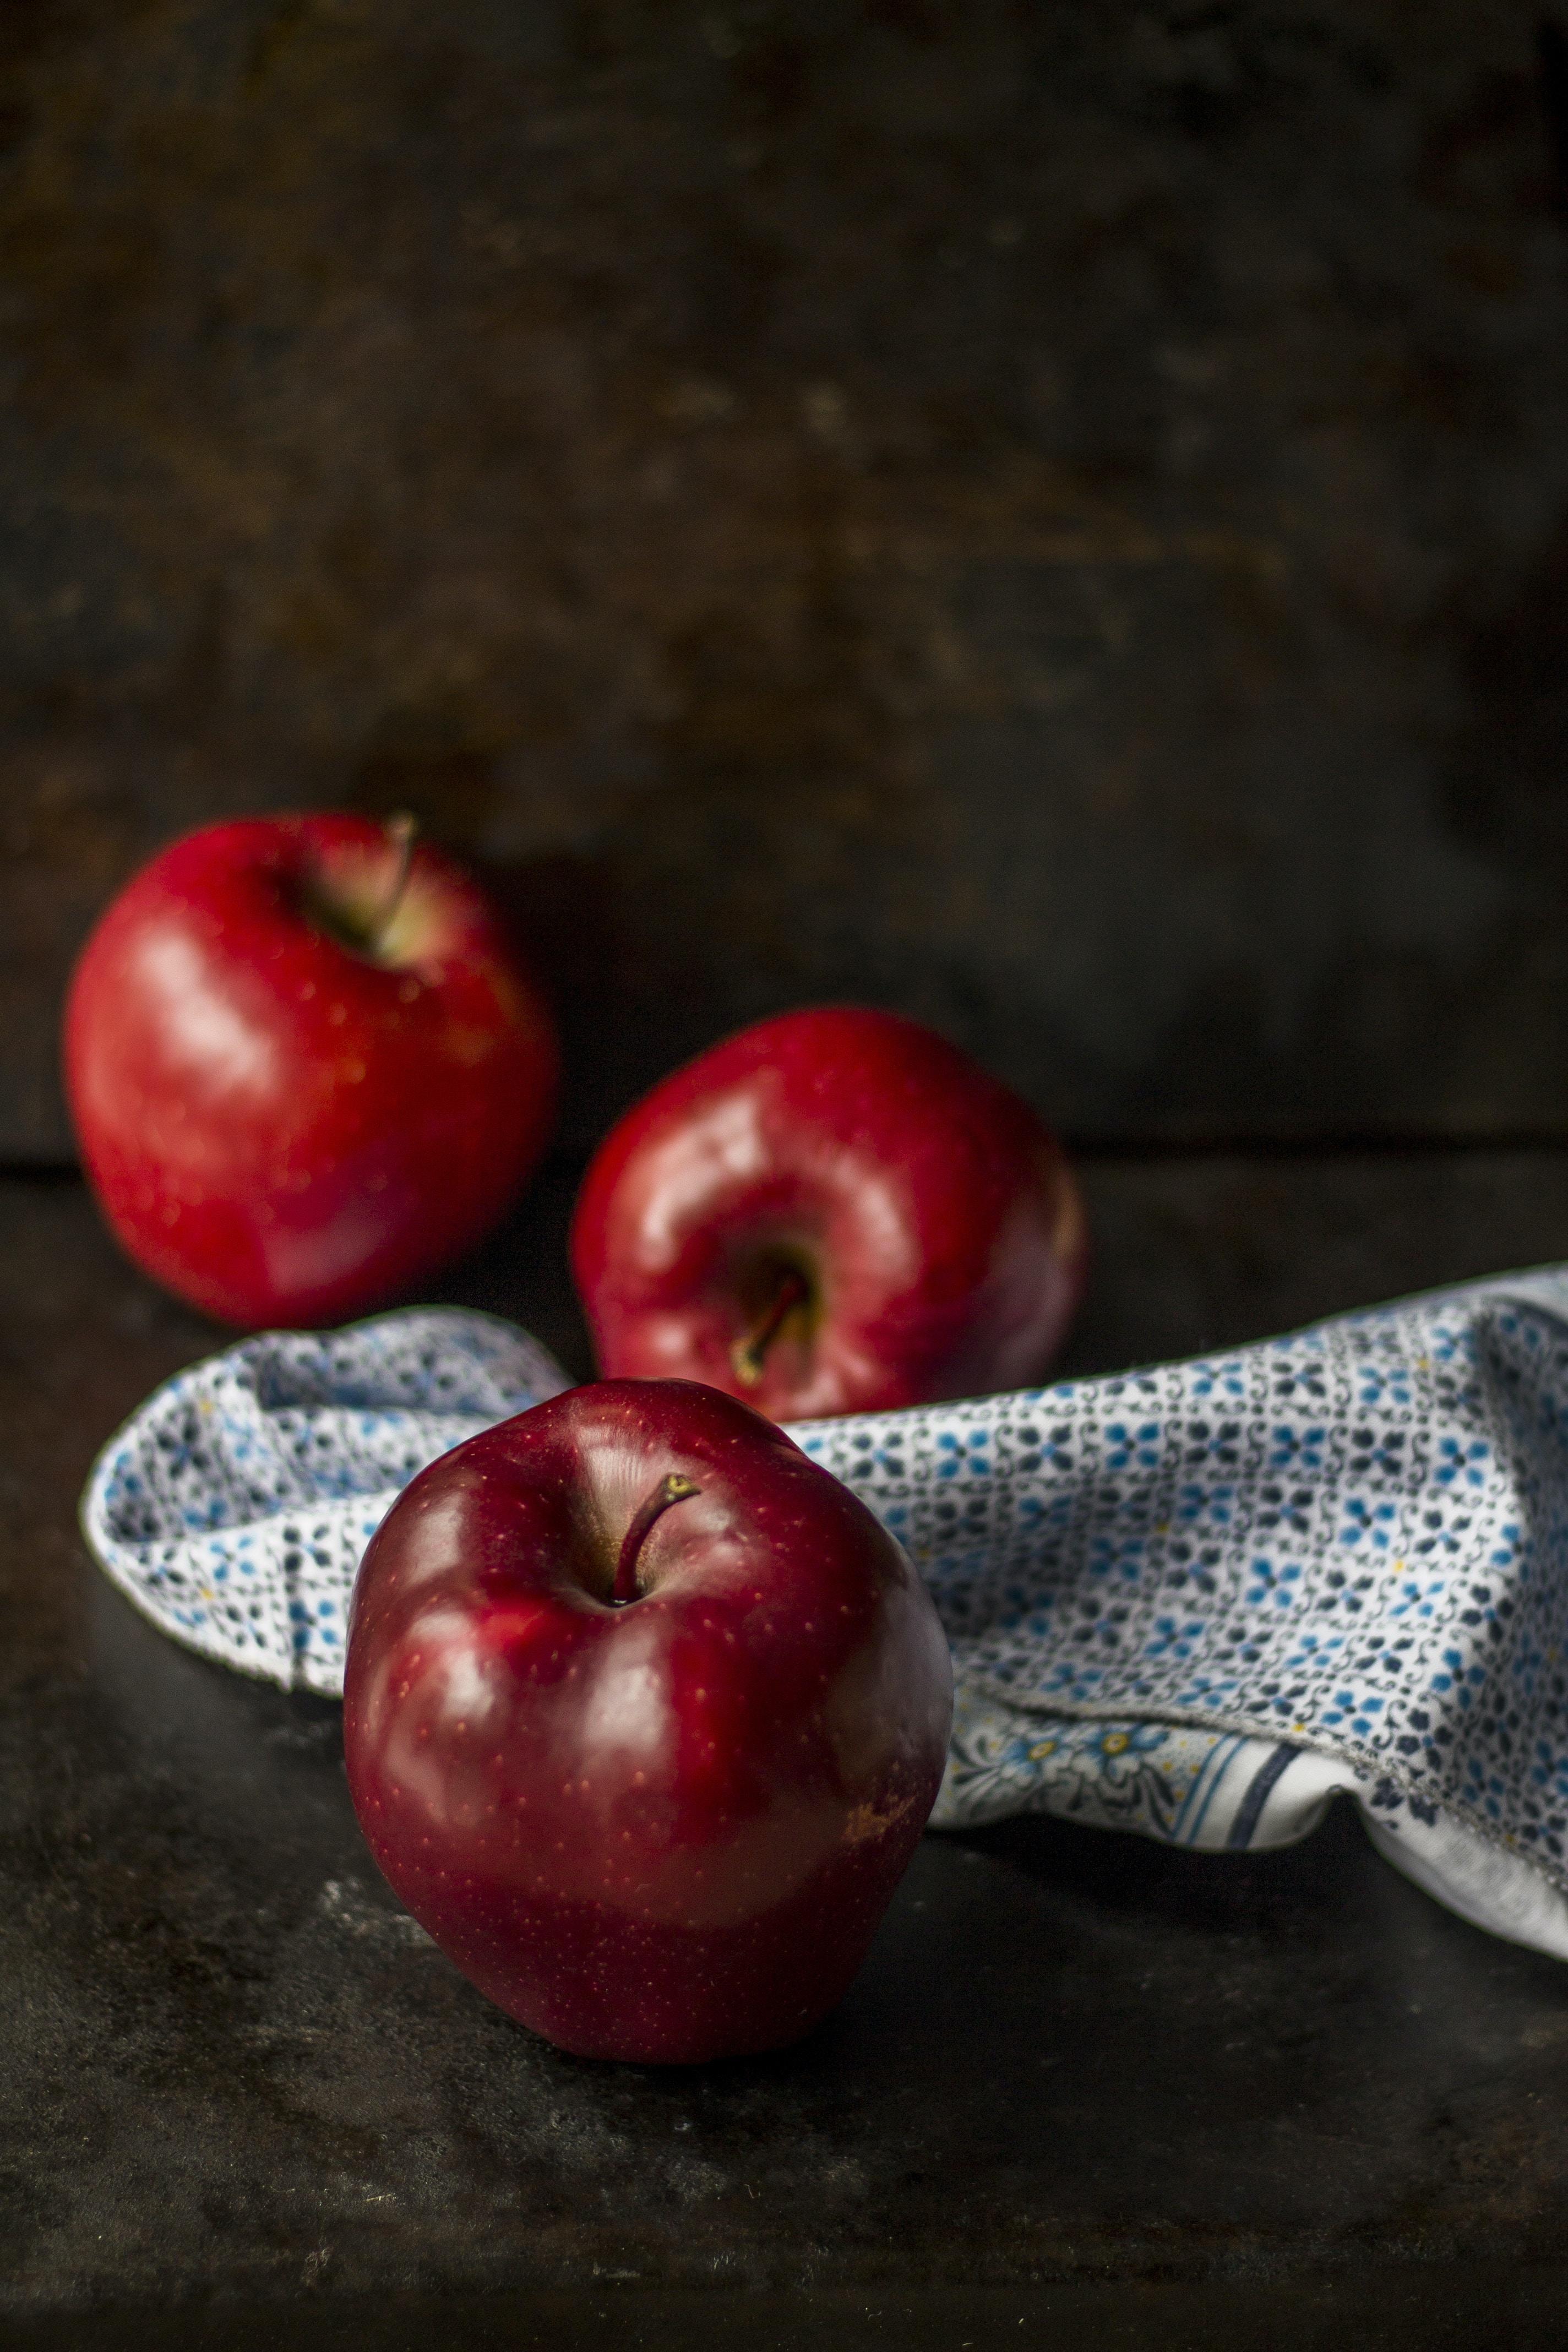 The Apple! apple stories